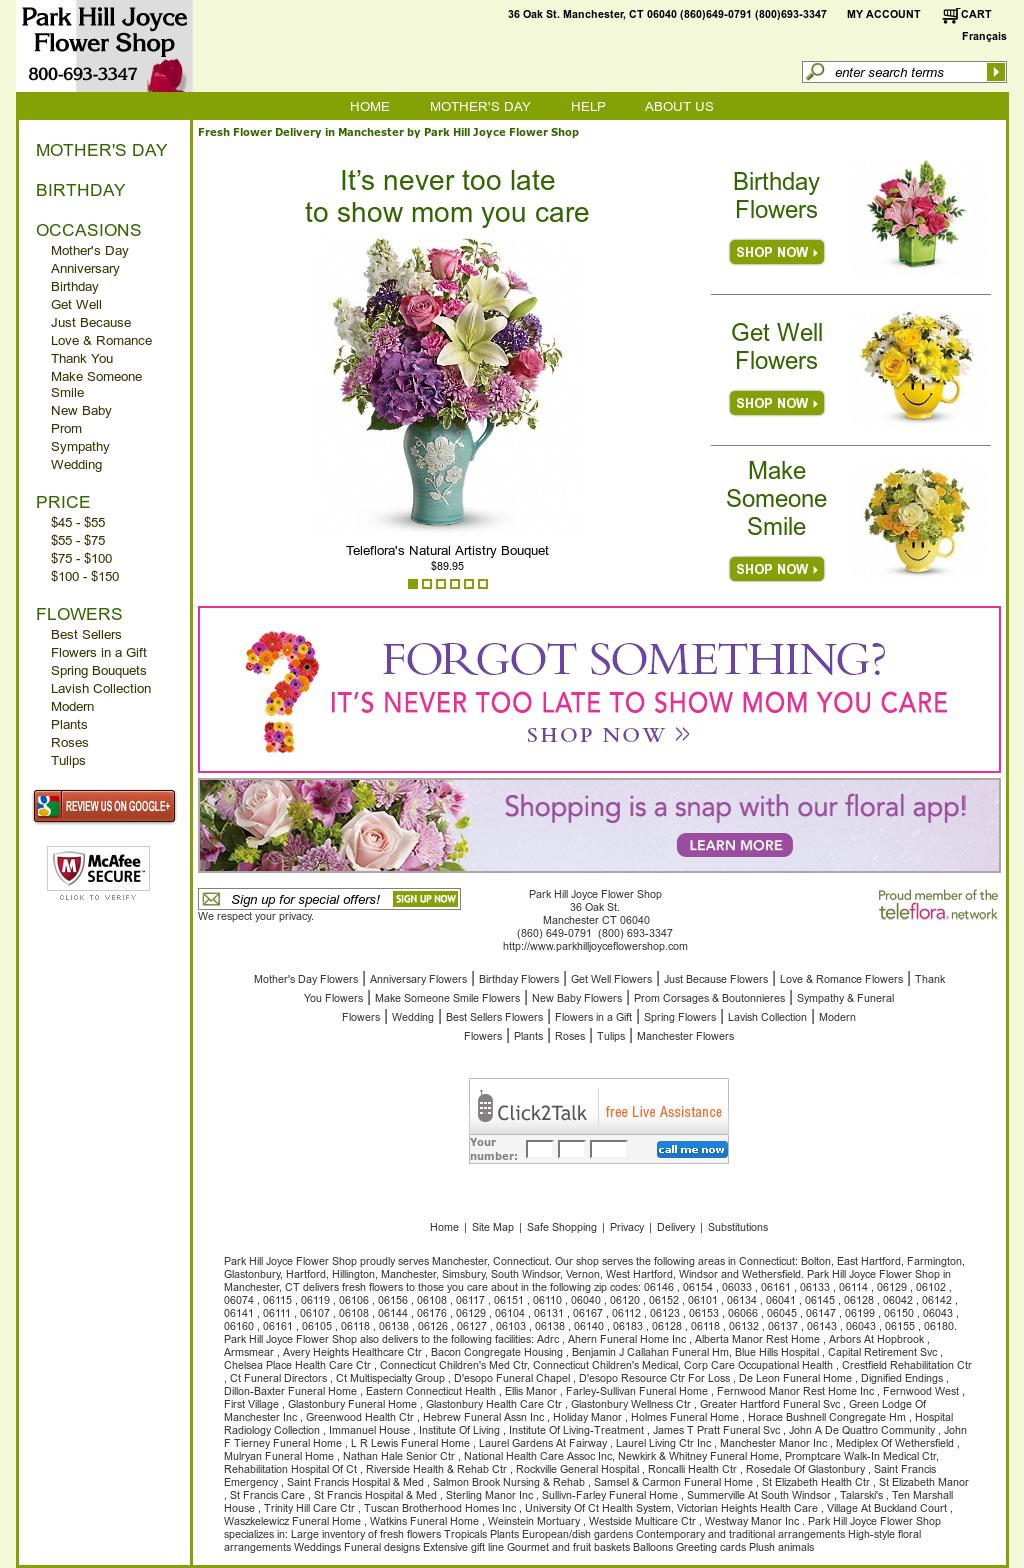 Park Hill Joyce Flower Shop Competitors Revenue And Employees